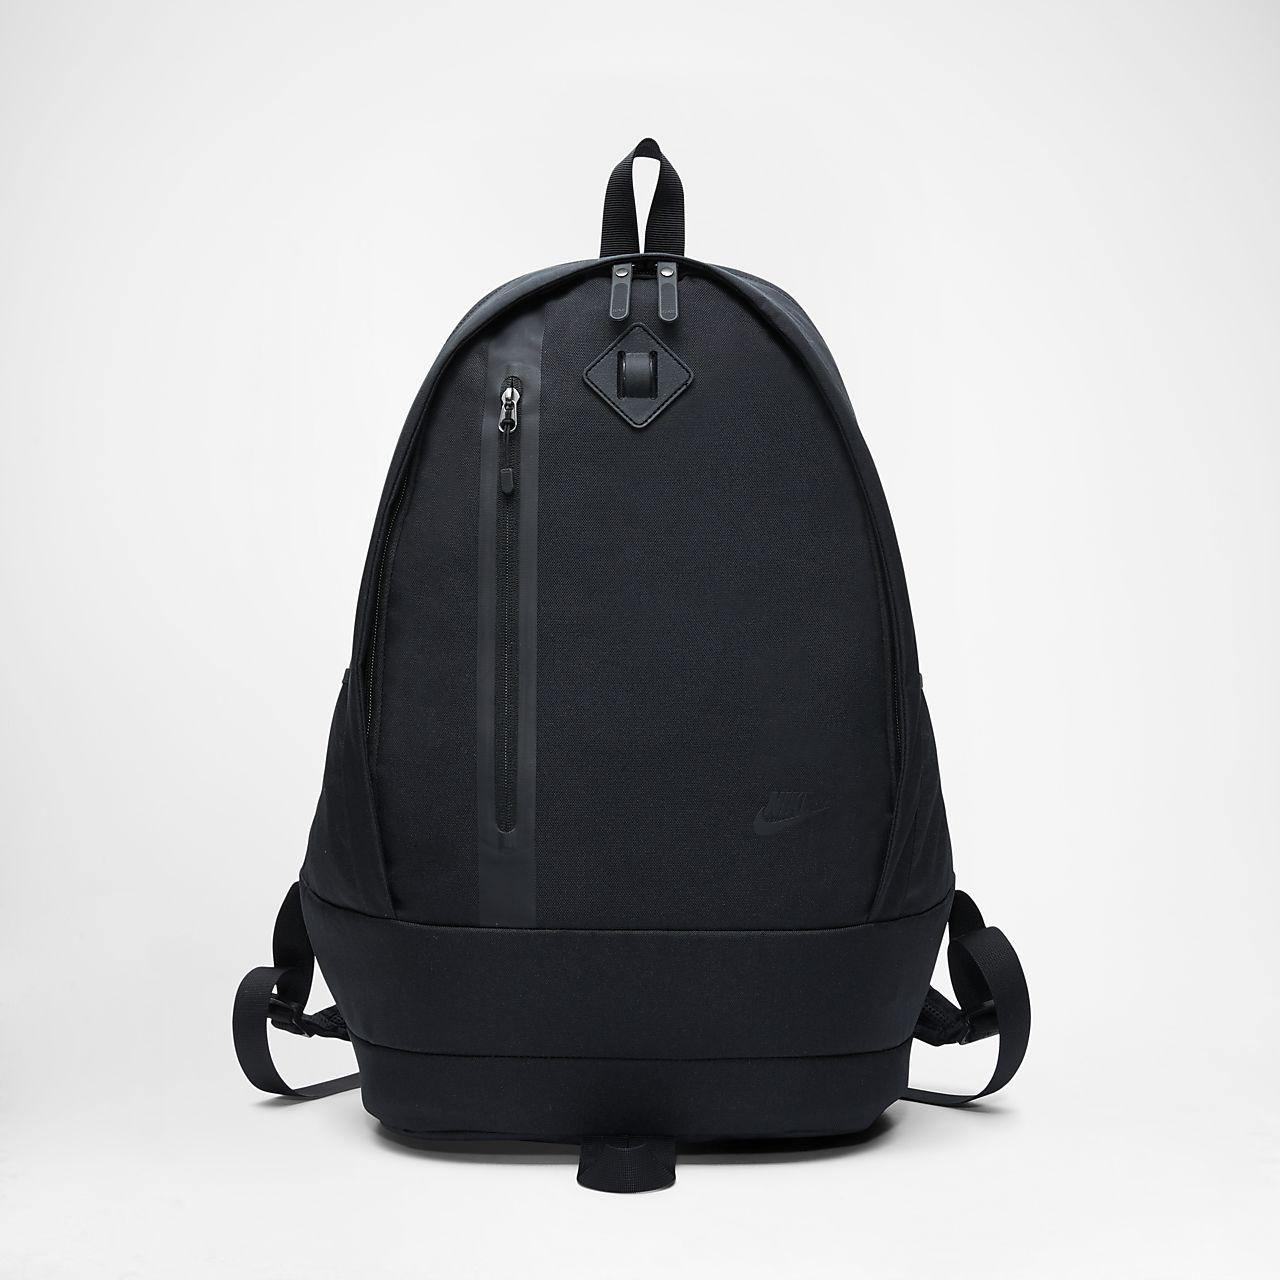 Zaino Nike Sportswear Cheyenne 3.0 Solid